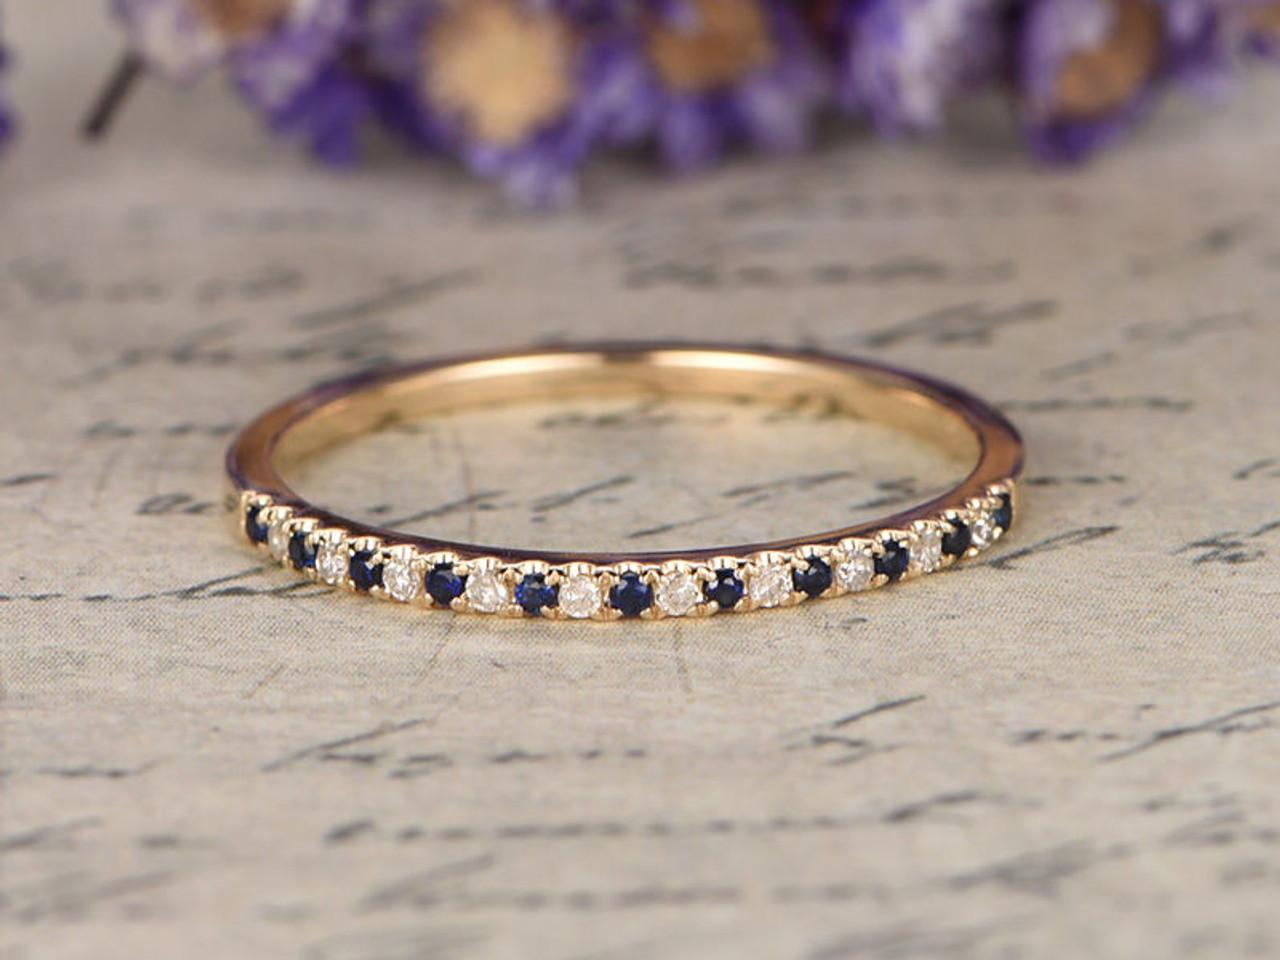 Blue sapphire Wedding Bands women diamondDiamond Engagement Ring